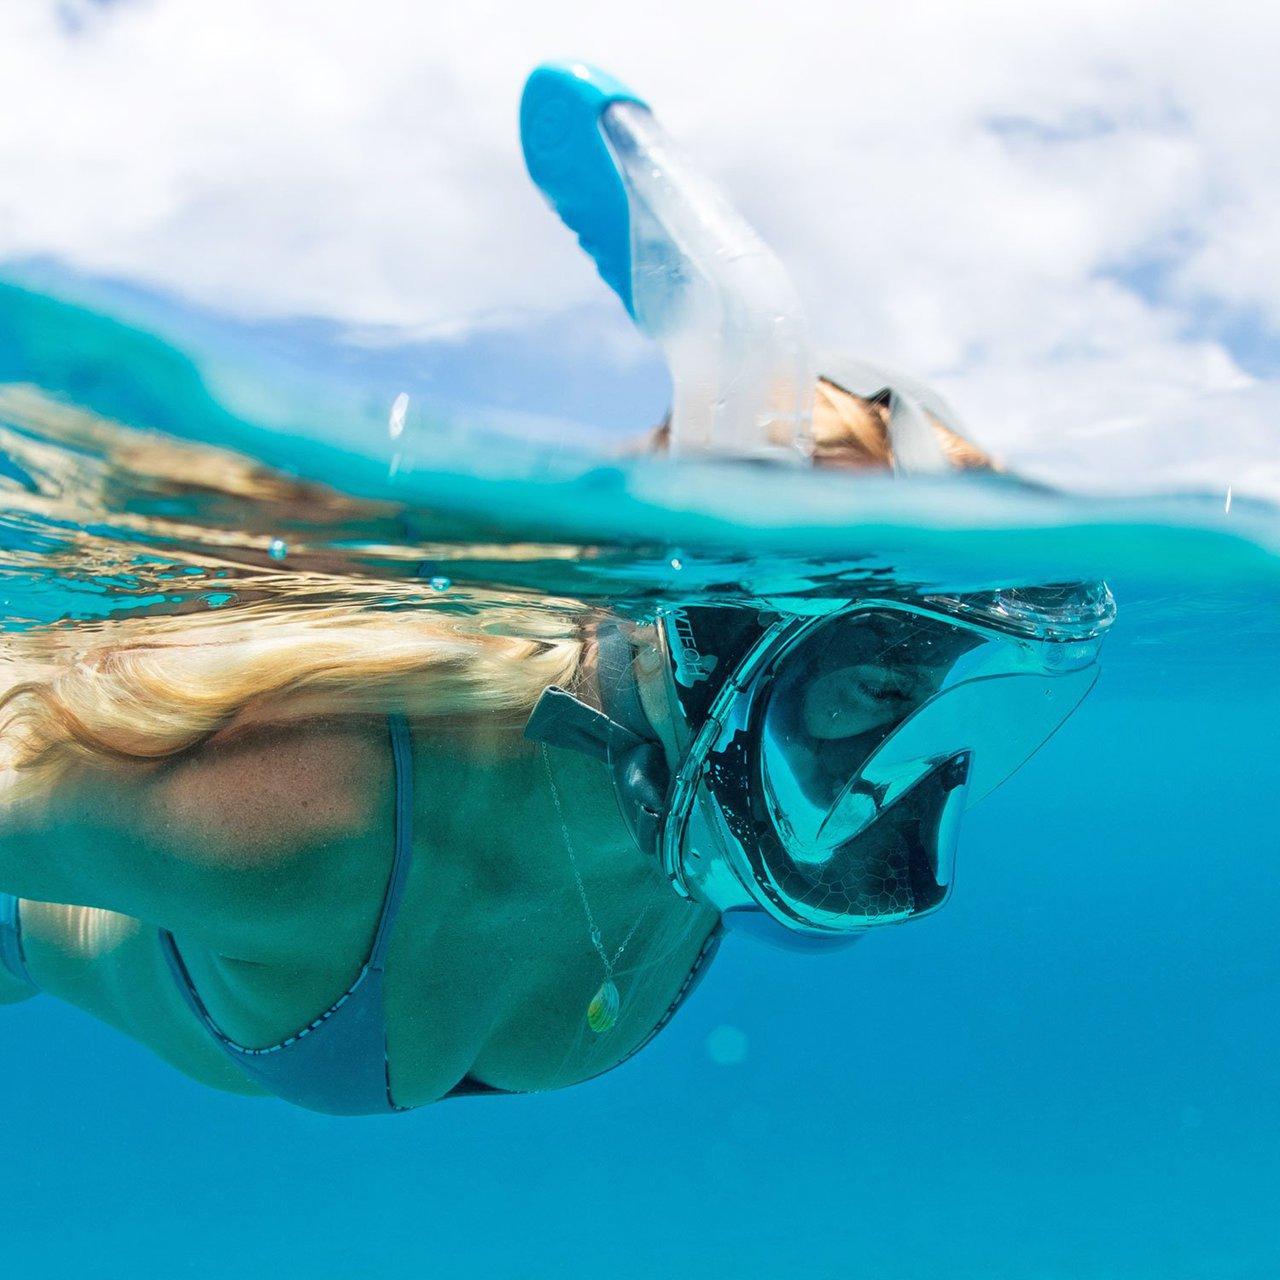 SEAVIEW 180° V2 Snorkel Mask